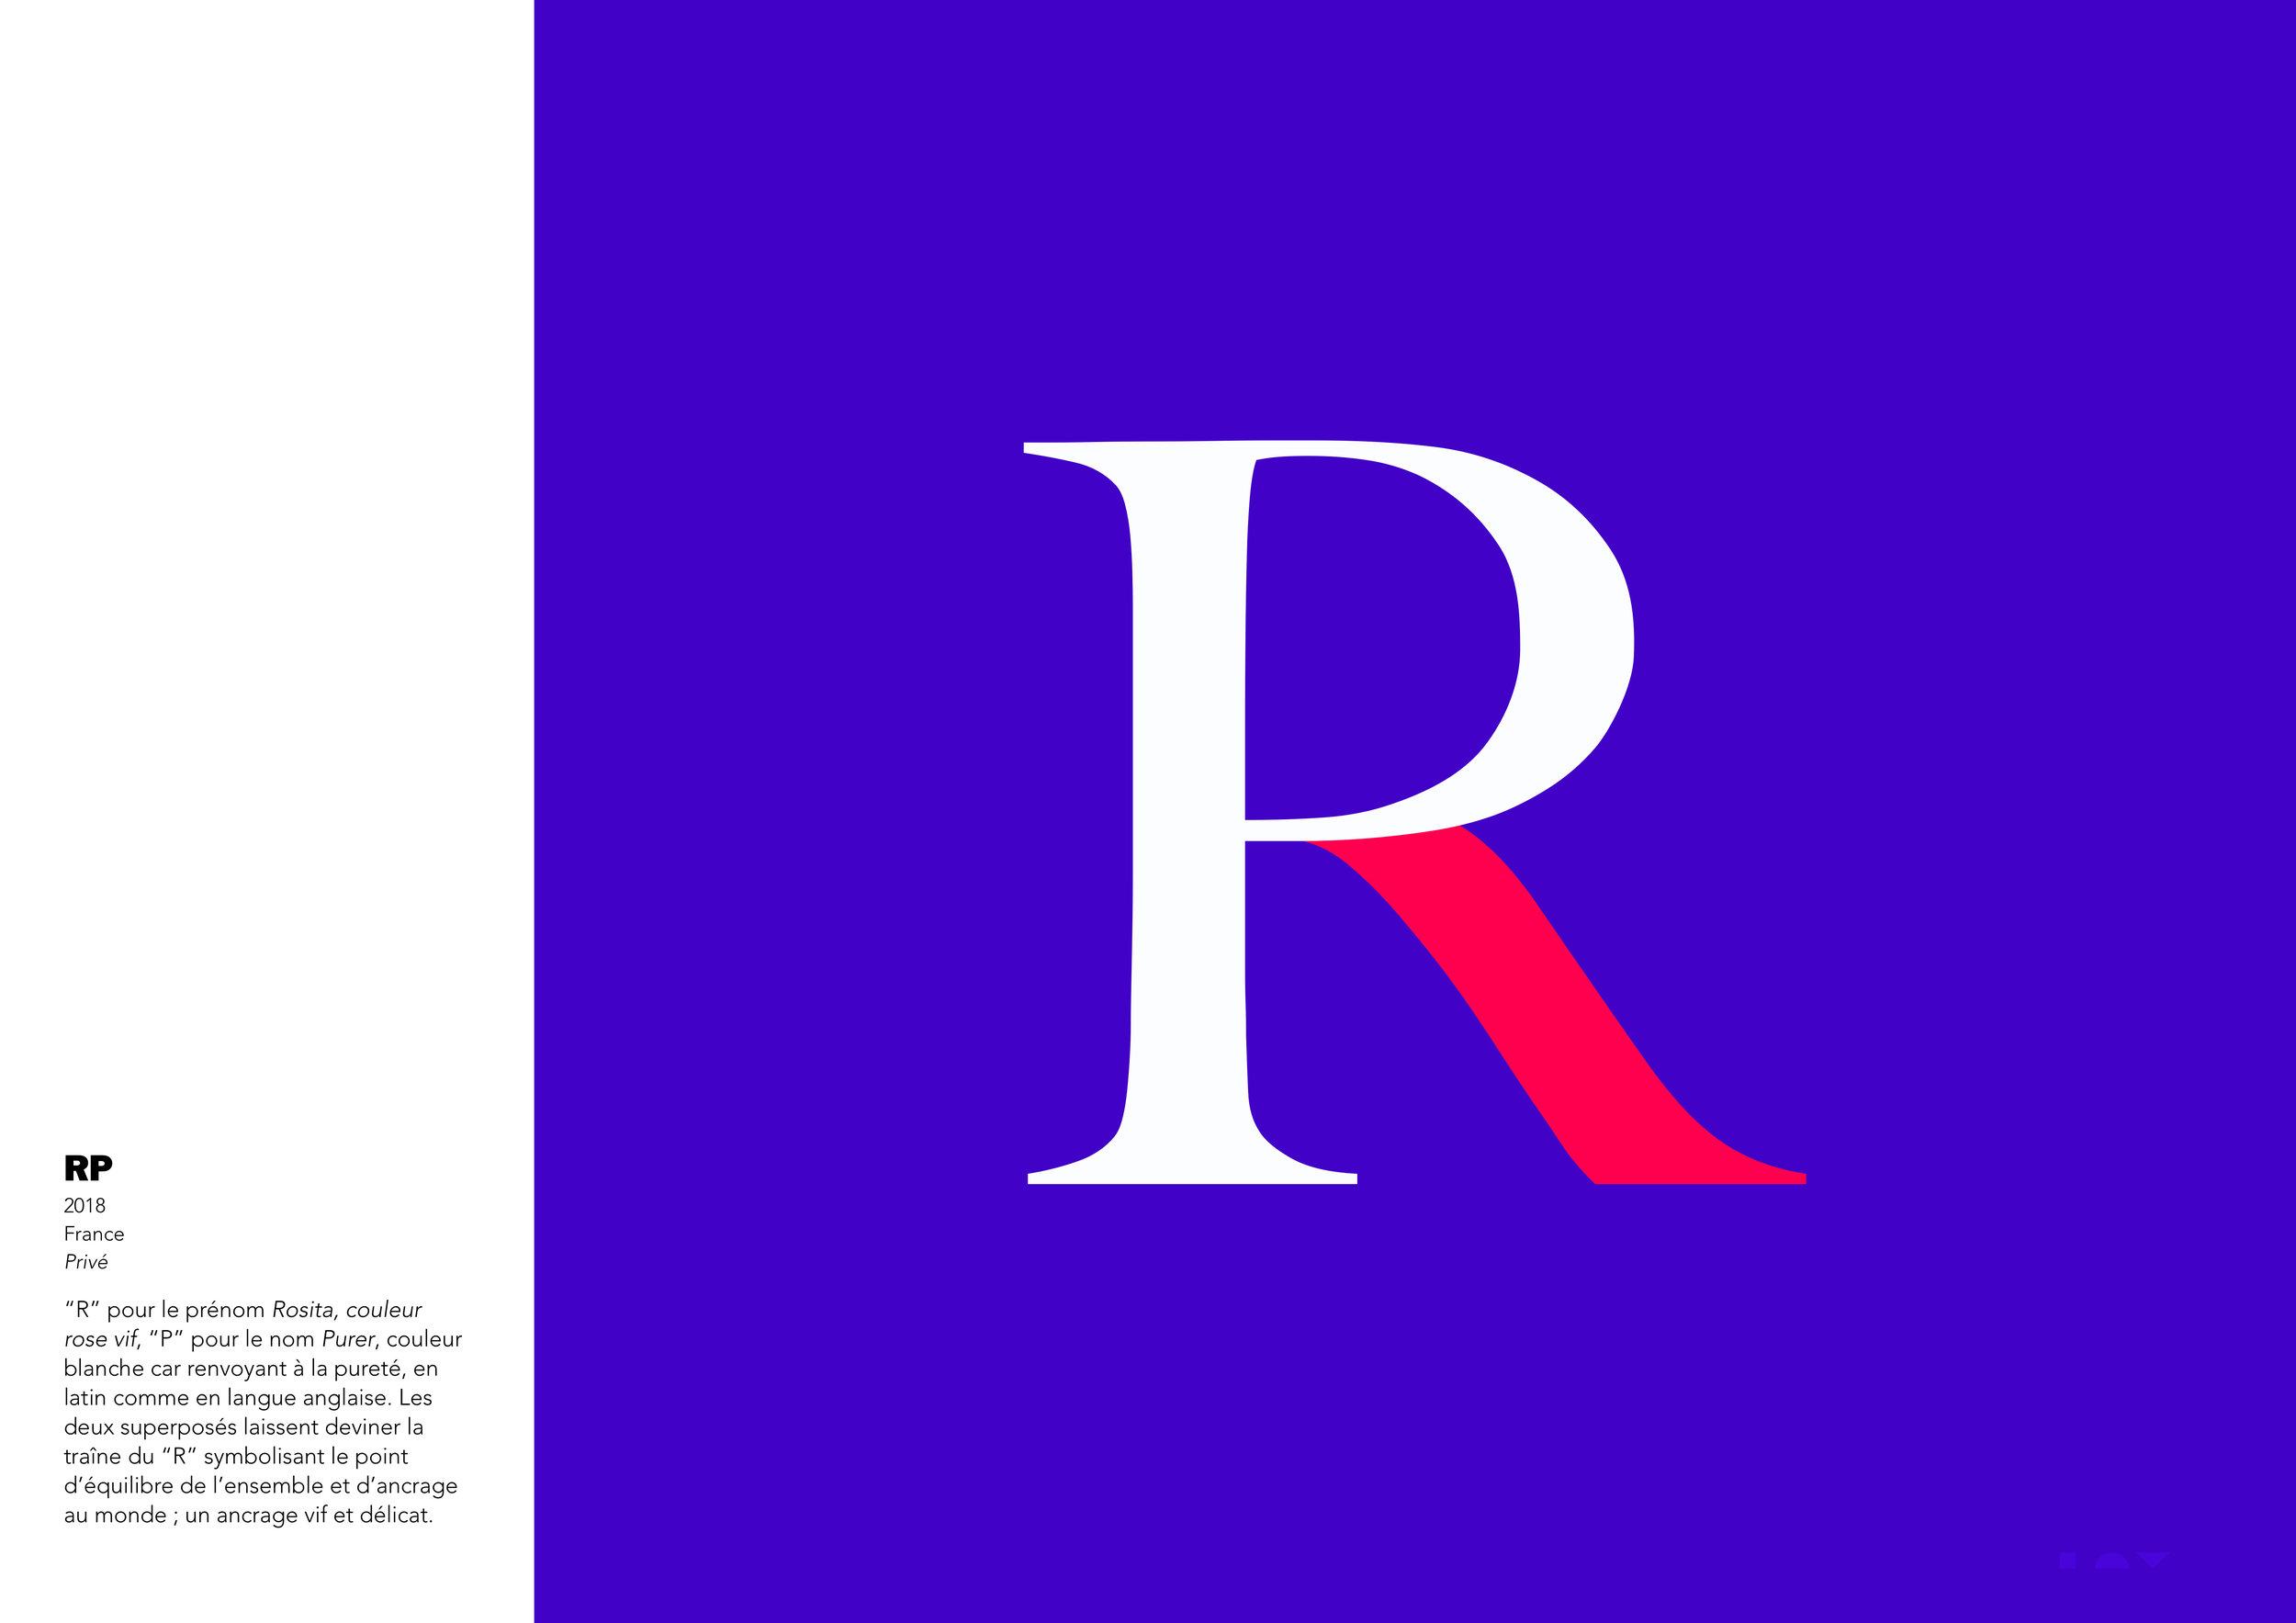 Rosita-P-monogram-logo-design-joy-lasry.jpg